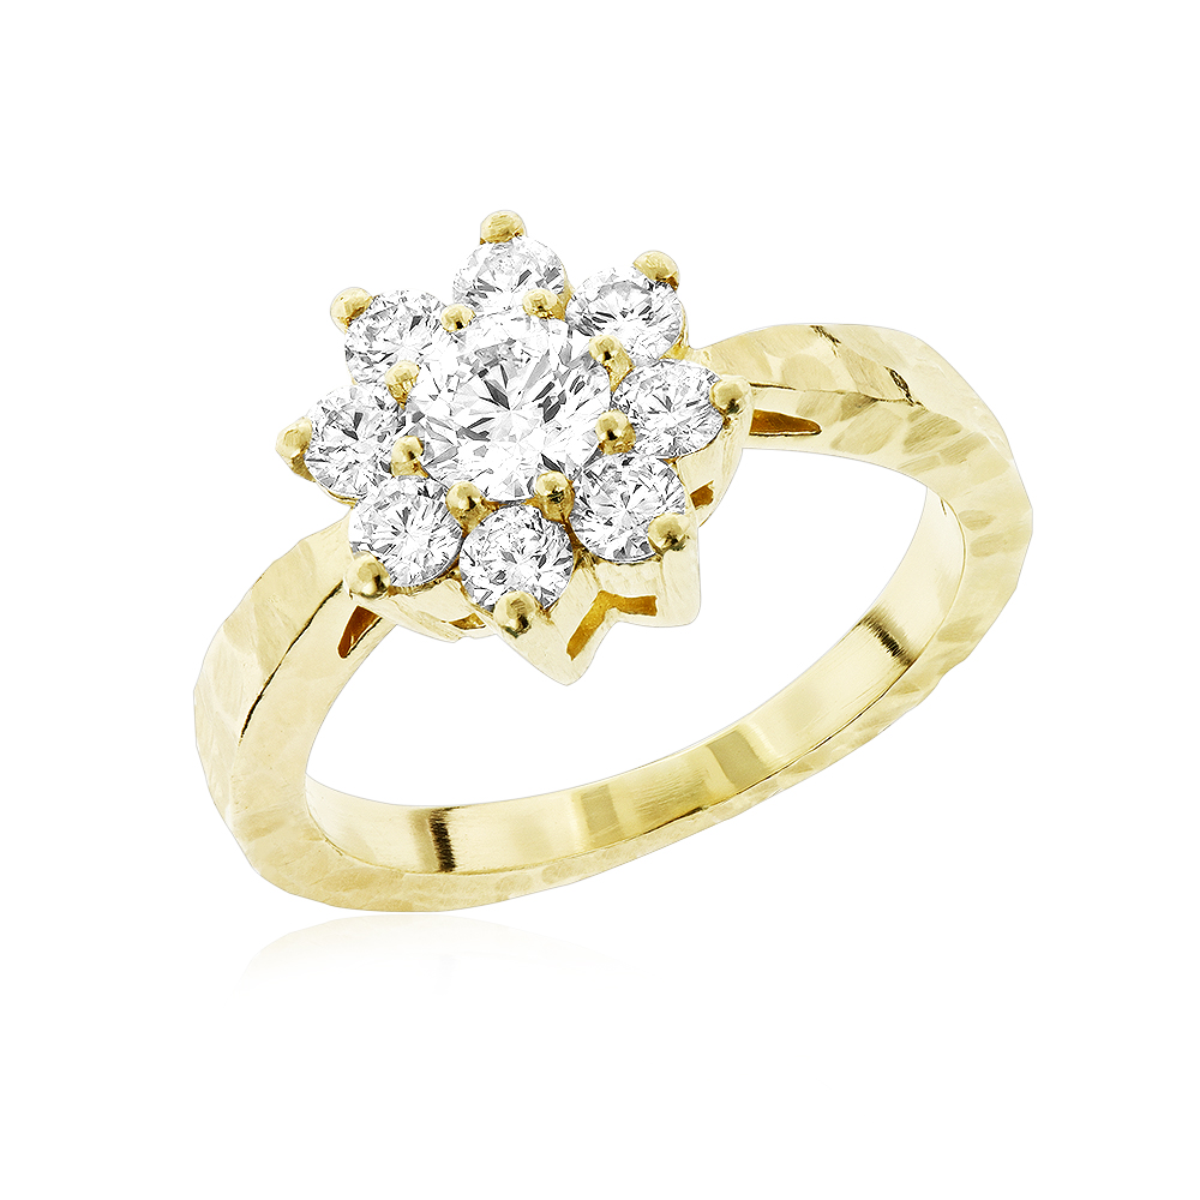 Ladies Diamond Cluster Rings: Hammered 14K Gold Diamond Flower Ring 1.3ct